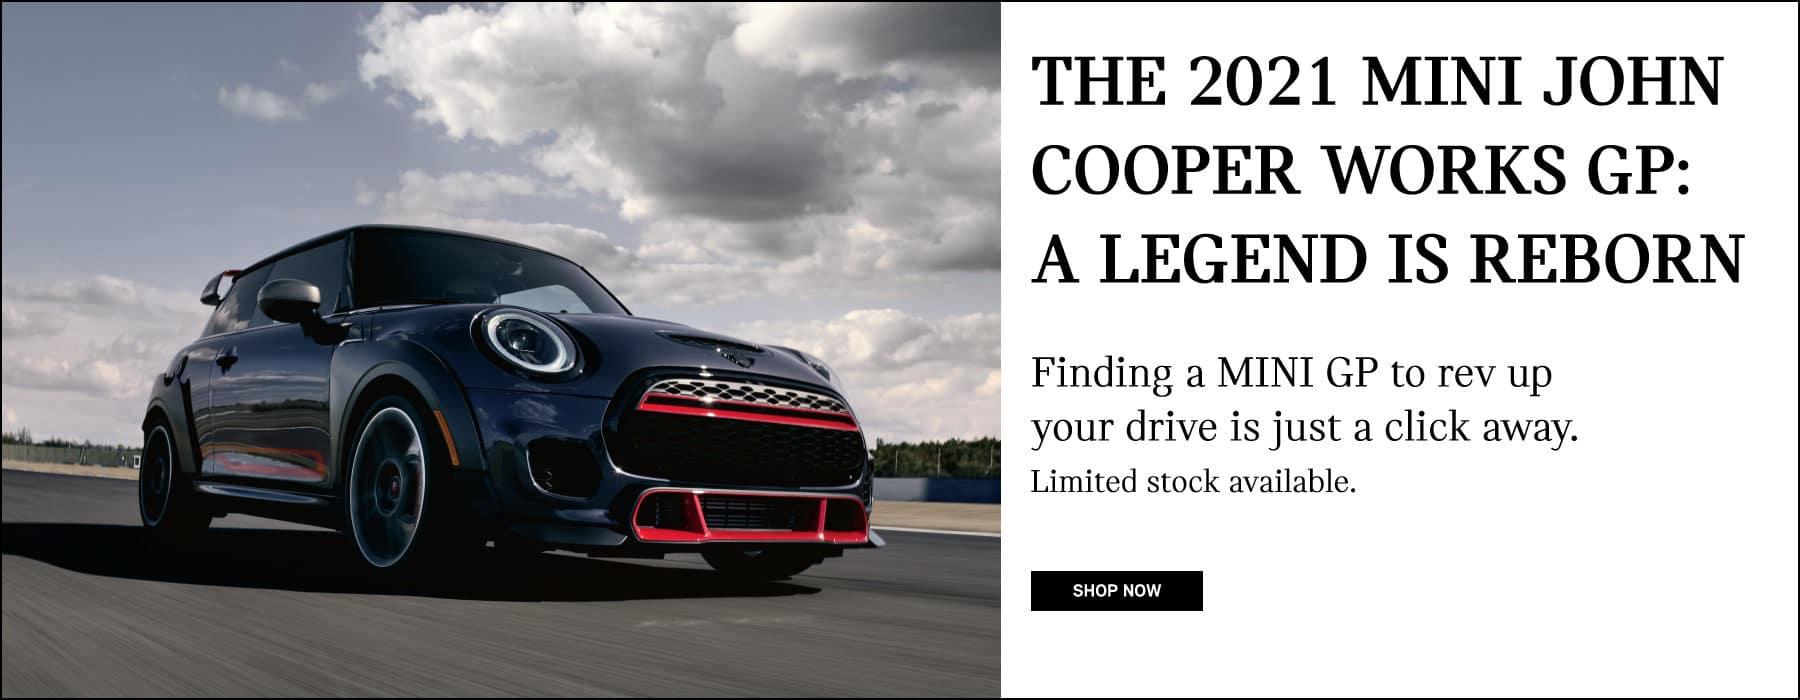 2021 MINI John Cooper Works GP: A legend is reborn. Shop Now.